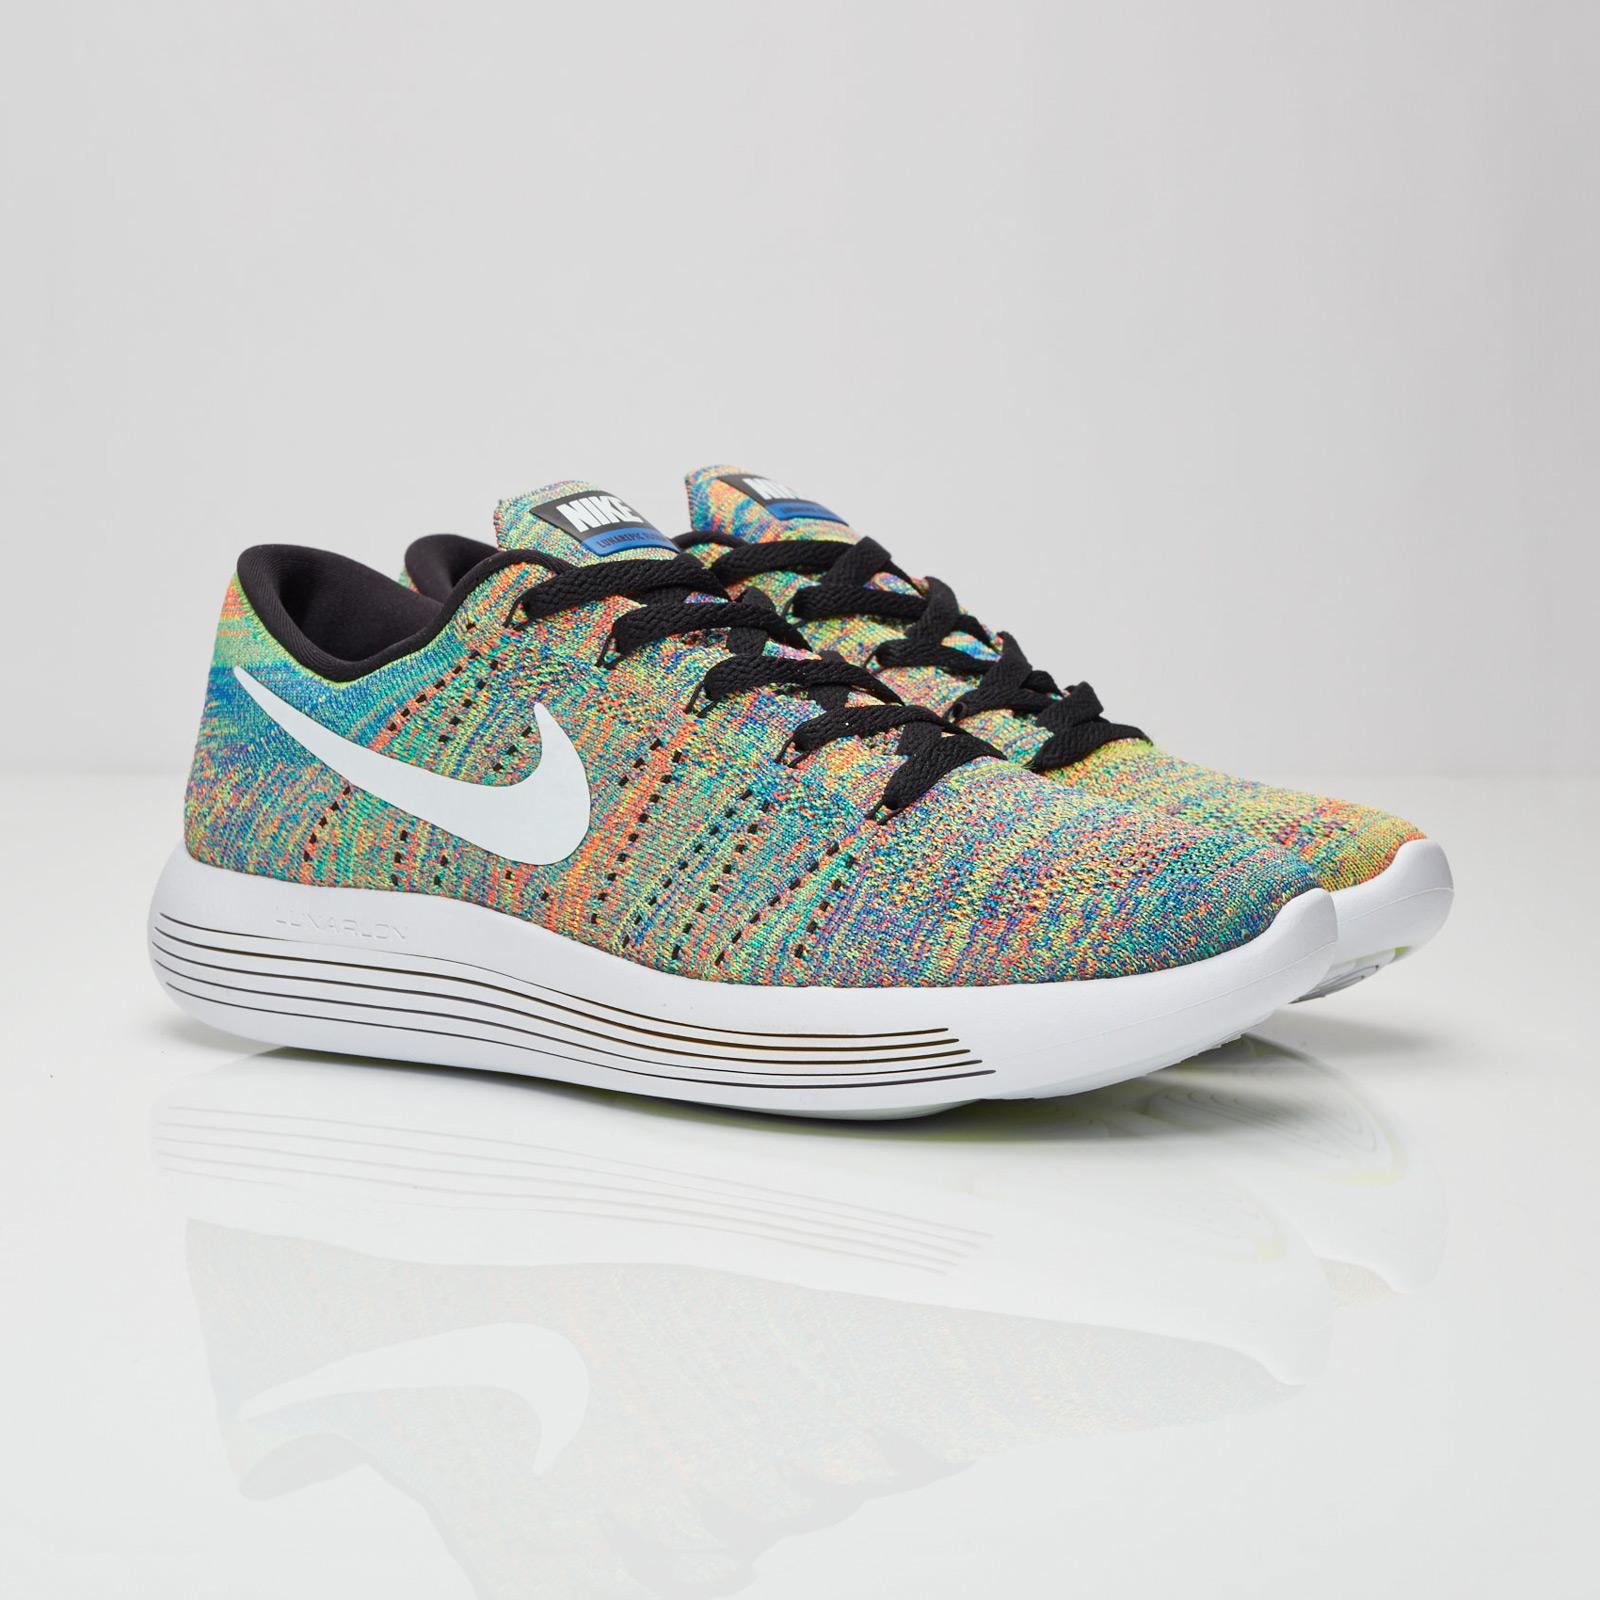 factory price 01576 9f858 Nike Lunarepic Low Flyknit